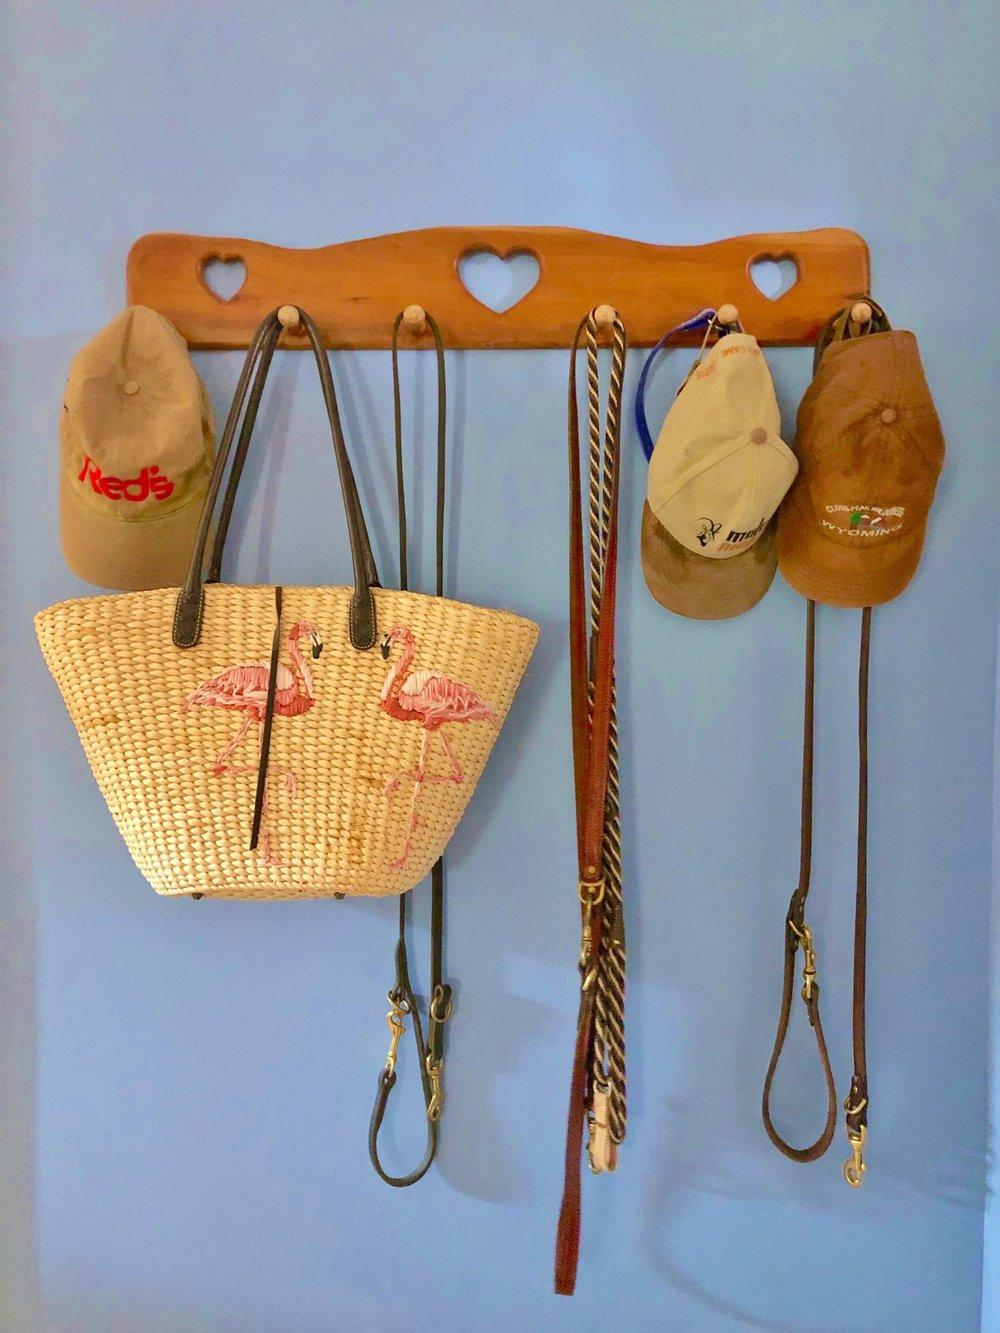 Handmade wood hat rack in periwinkle blue laundry room | Carla Aston, Designer